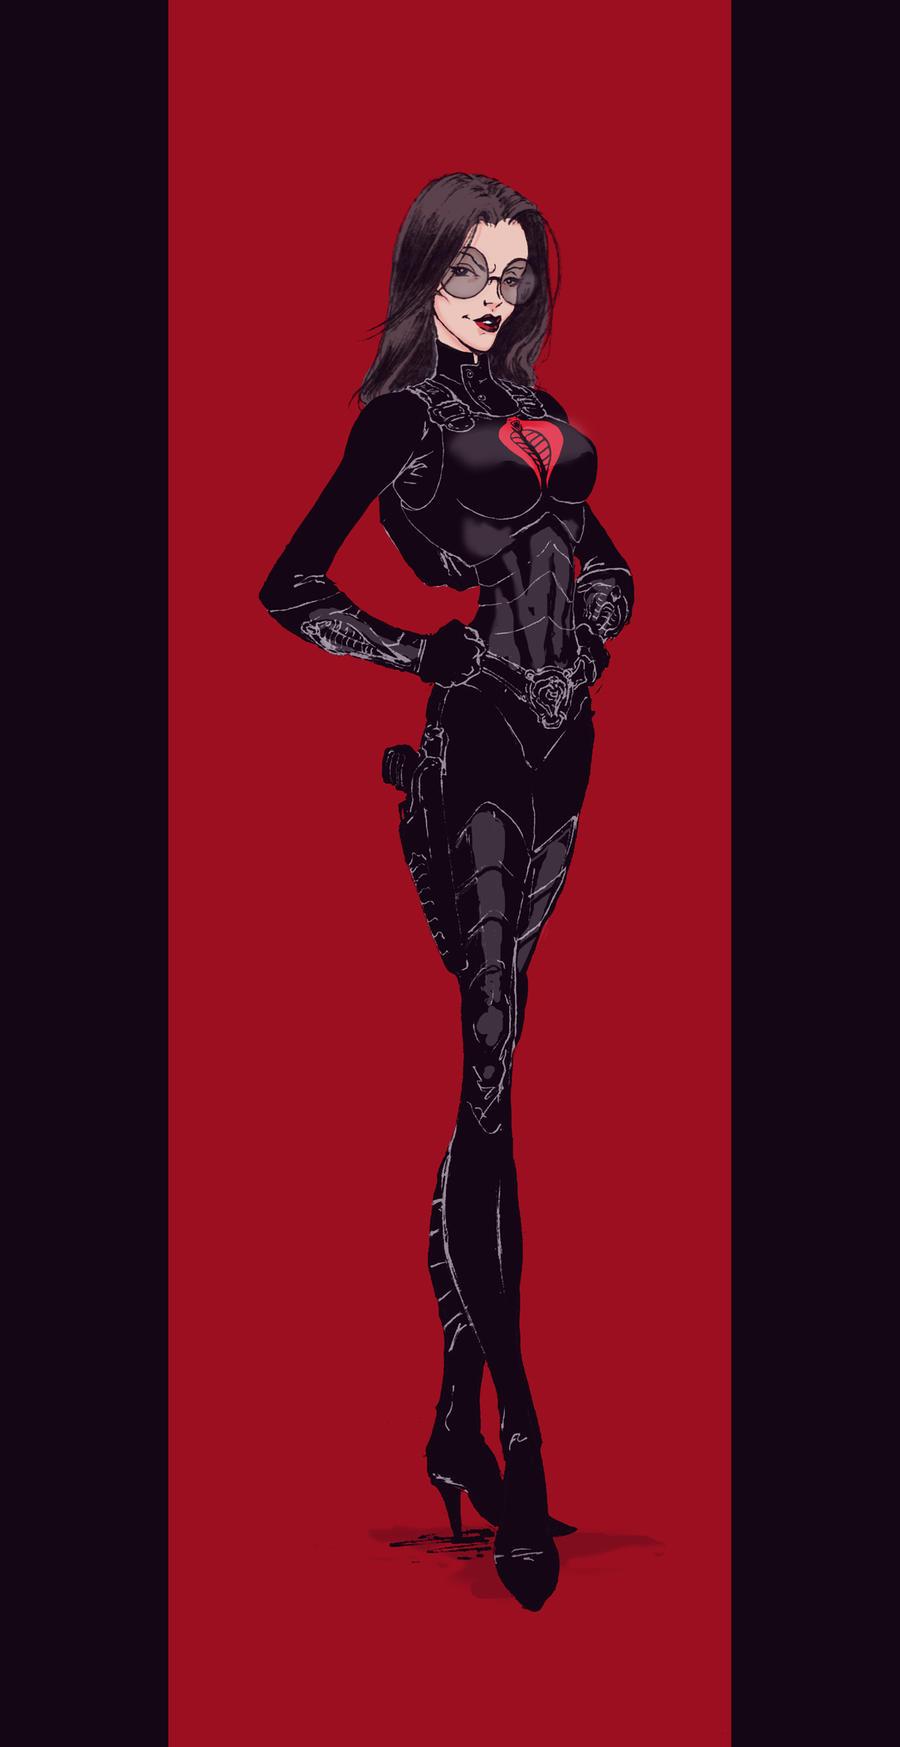 Baroness by joebenitez